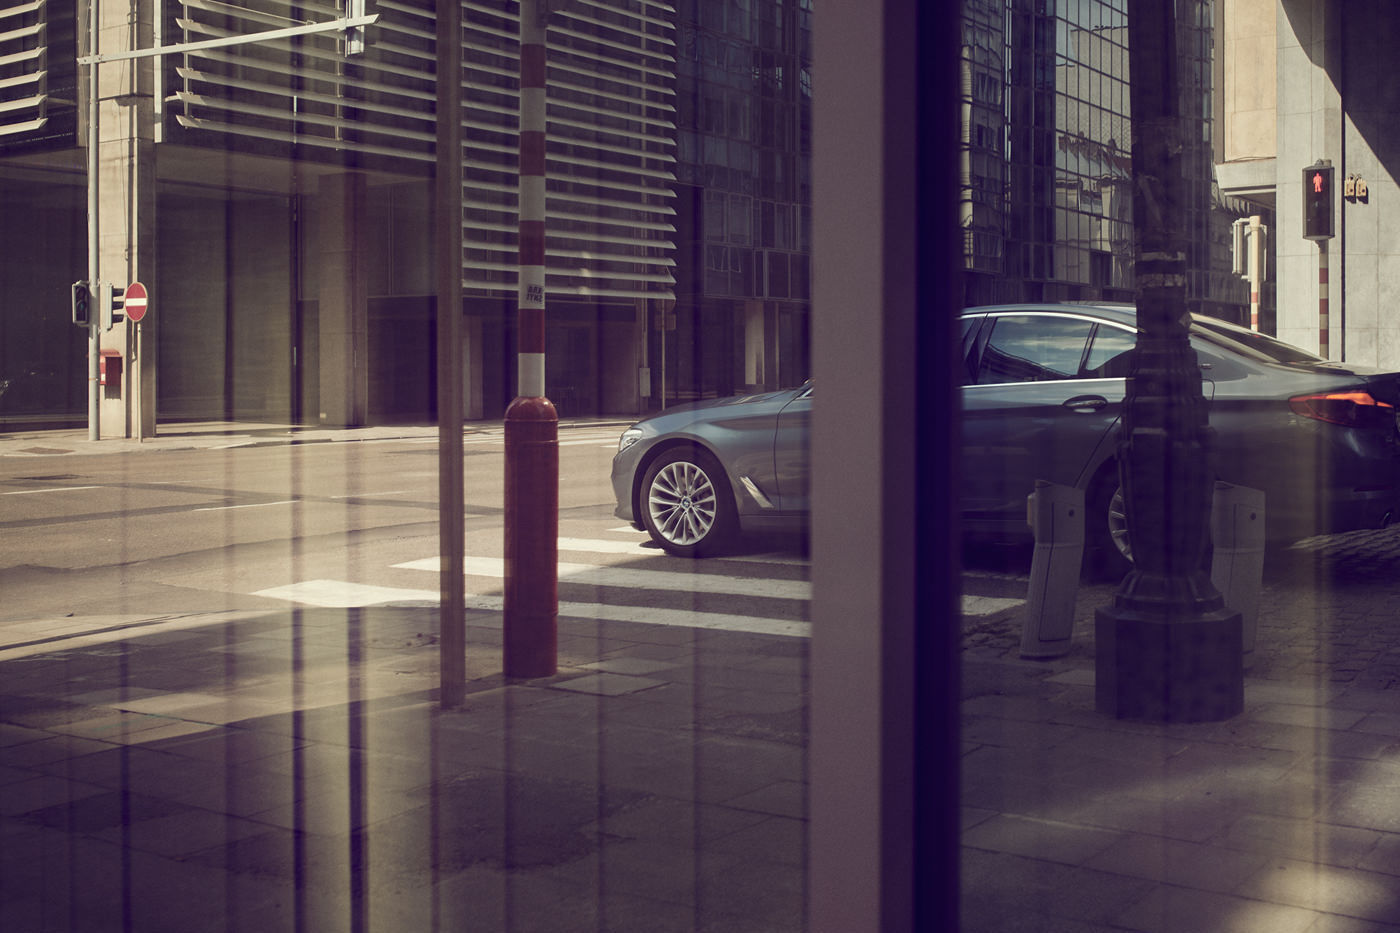 BEN & MARTIN, BAM PHOTOGRAPHERS C/O KAI TIETZ, BMW iPerformance